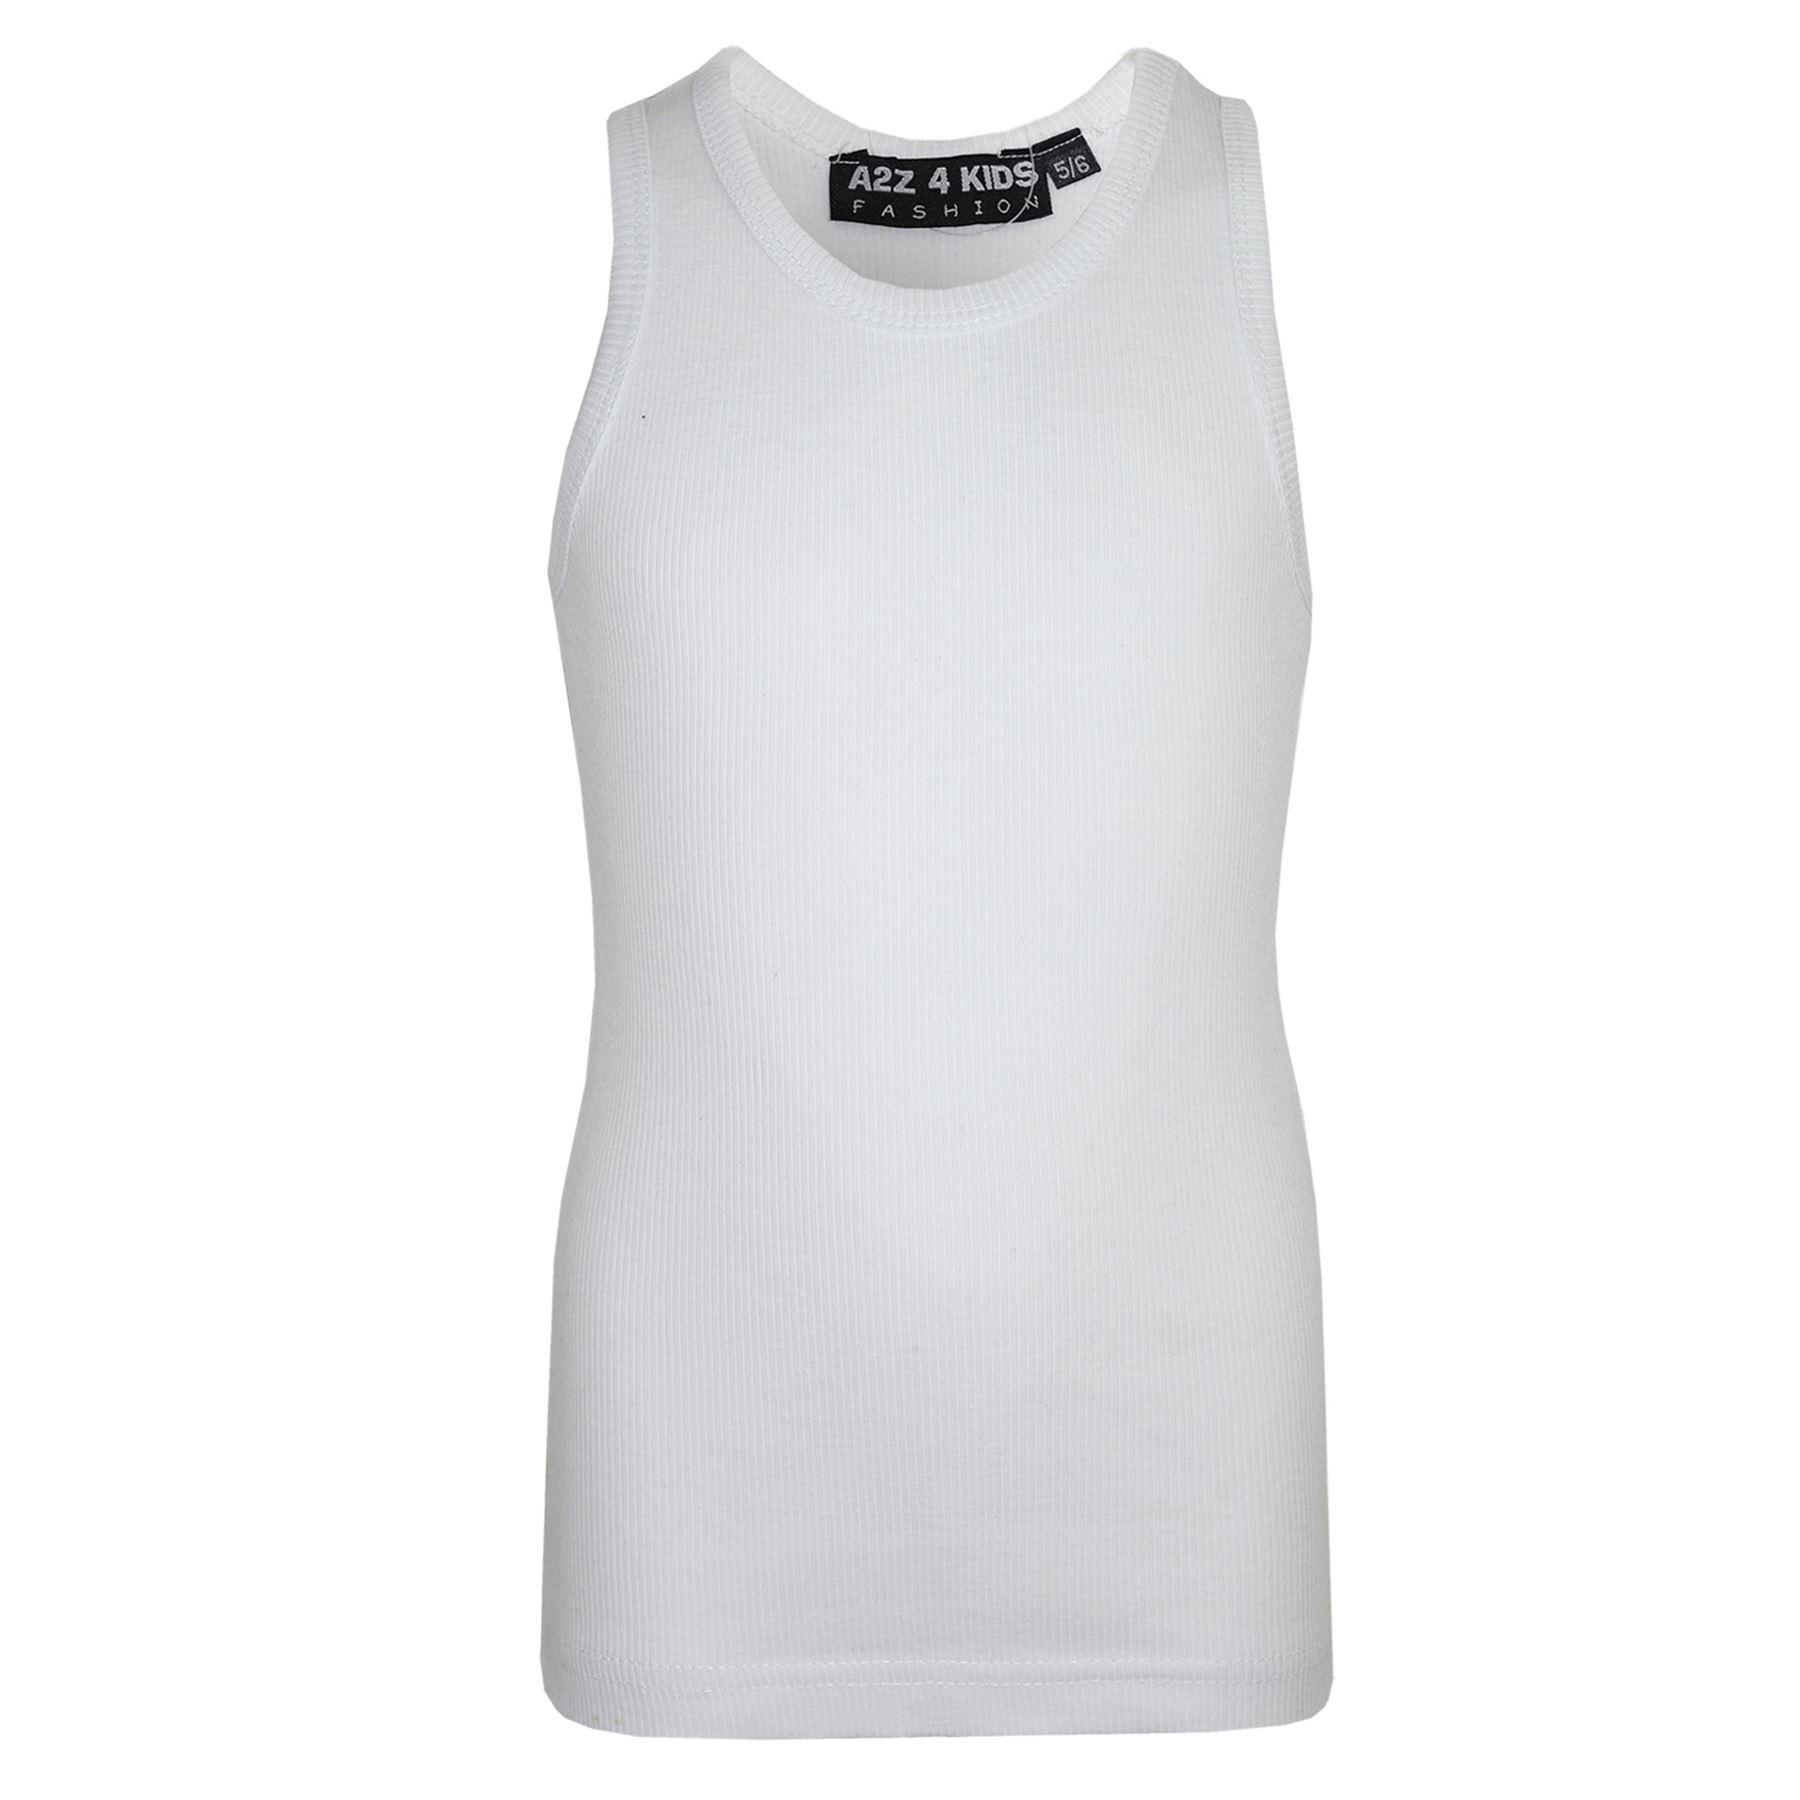 A2Z 4 Kids/® Kids Girls Ribbed Stylish Vest Top 100/% Cotton Fashion T Shirt New Age 5 6 7 8 9 10 11 12 13 Year